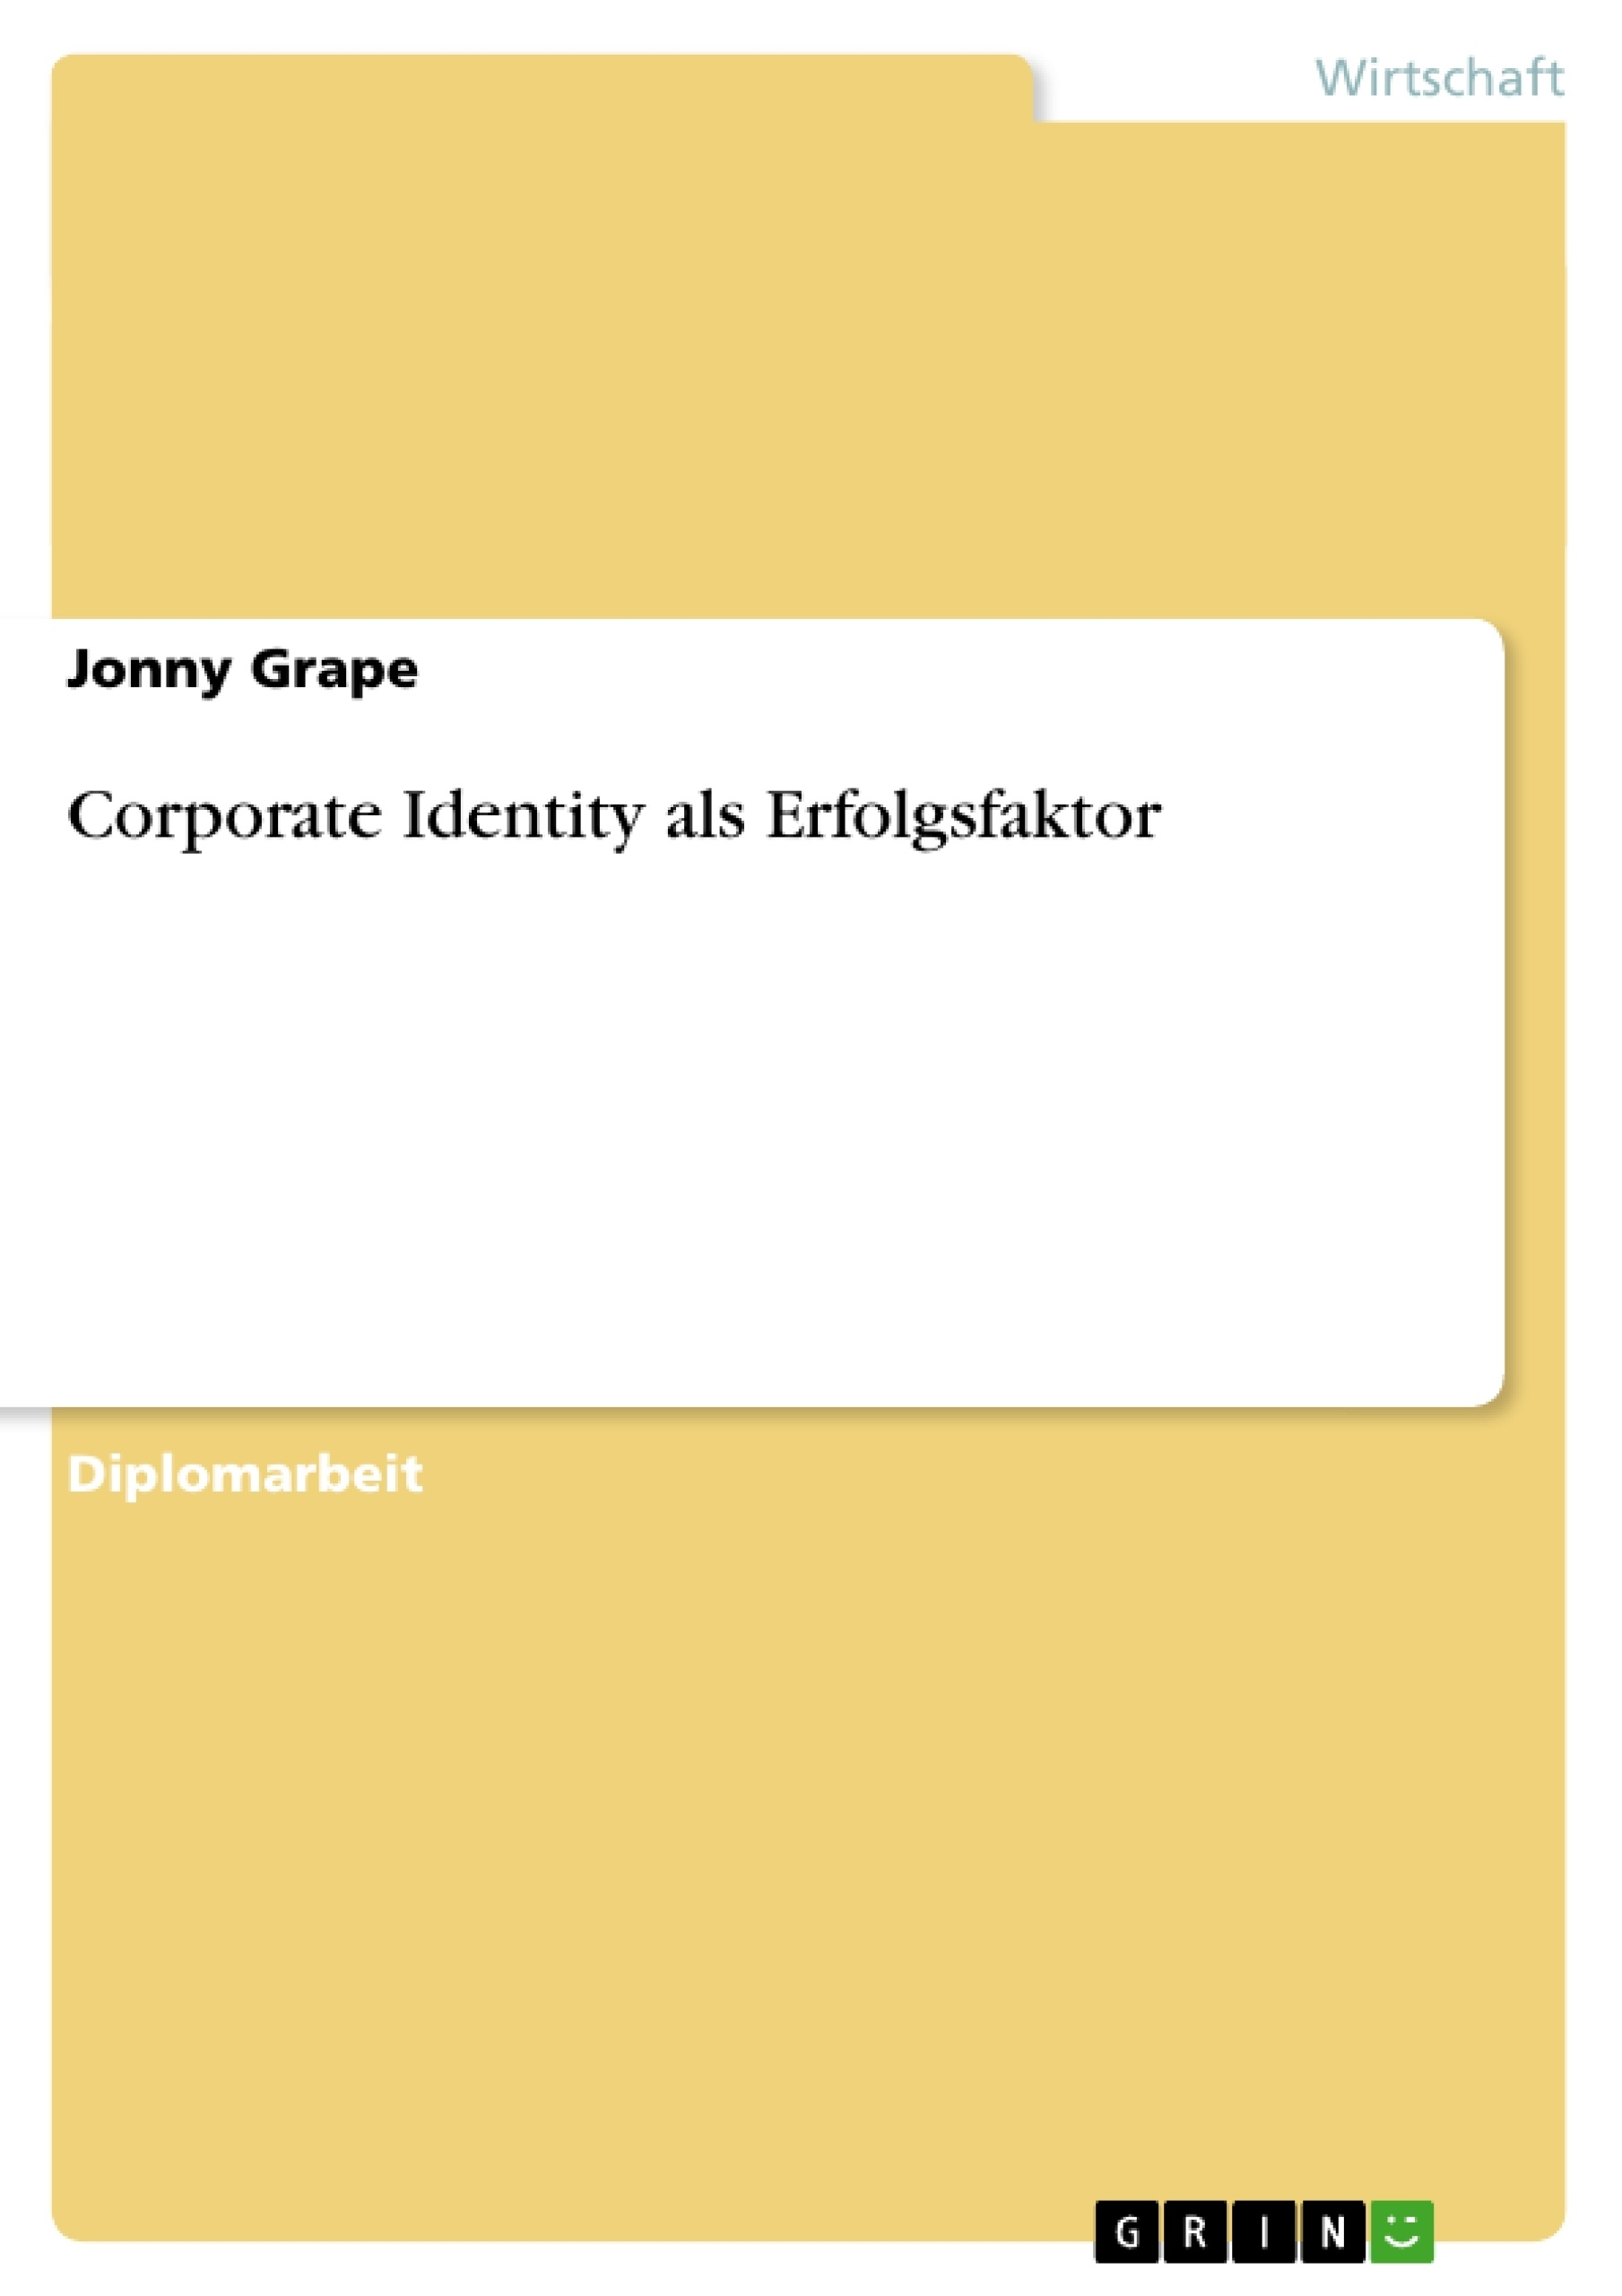 Titel: Corporate Identity als Erfolgsfaktor